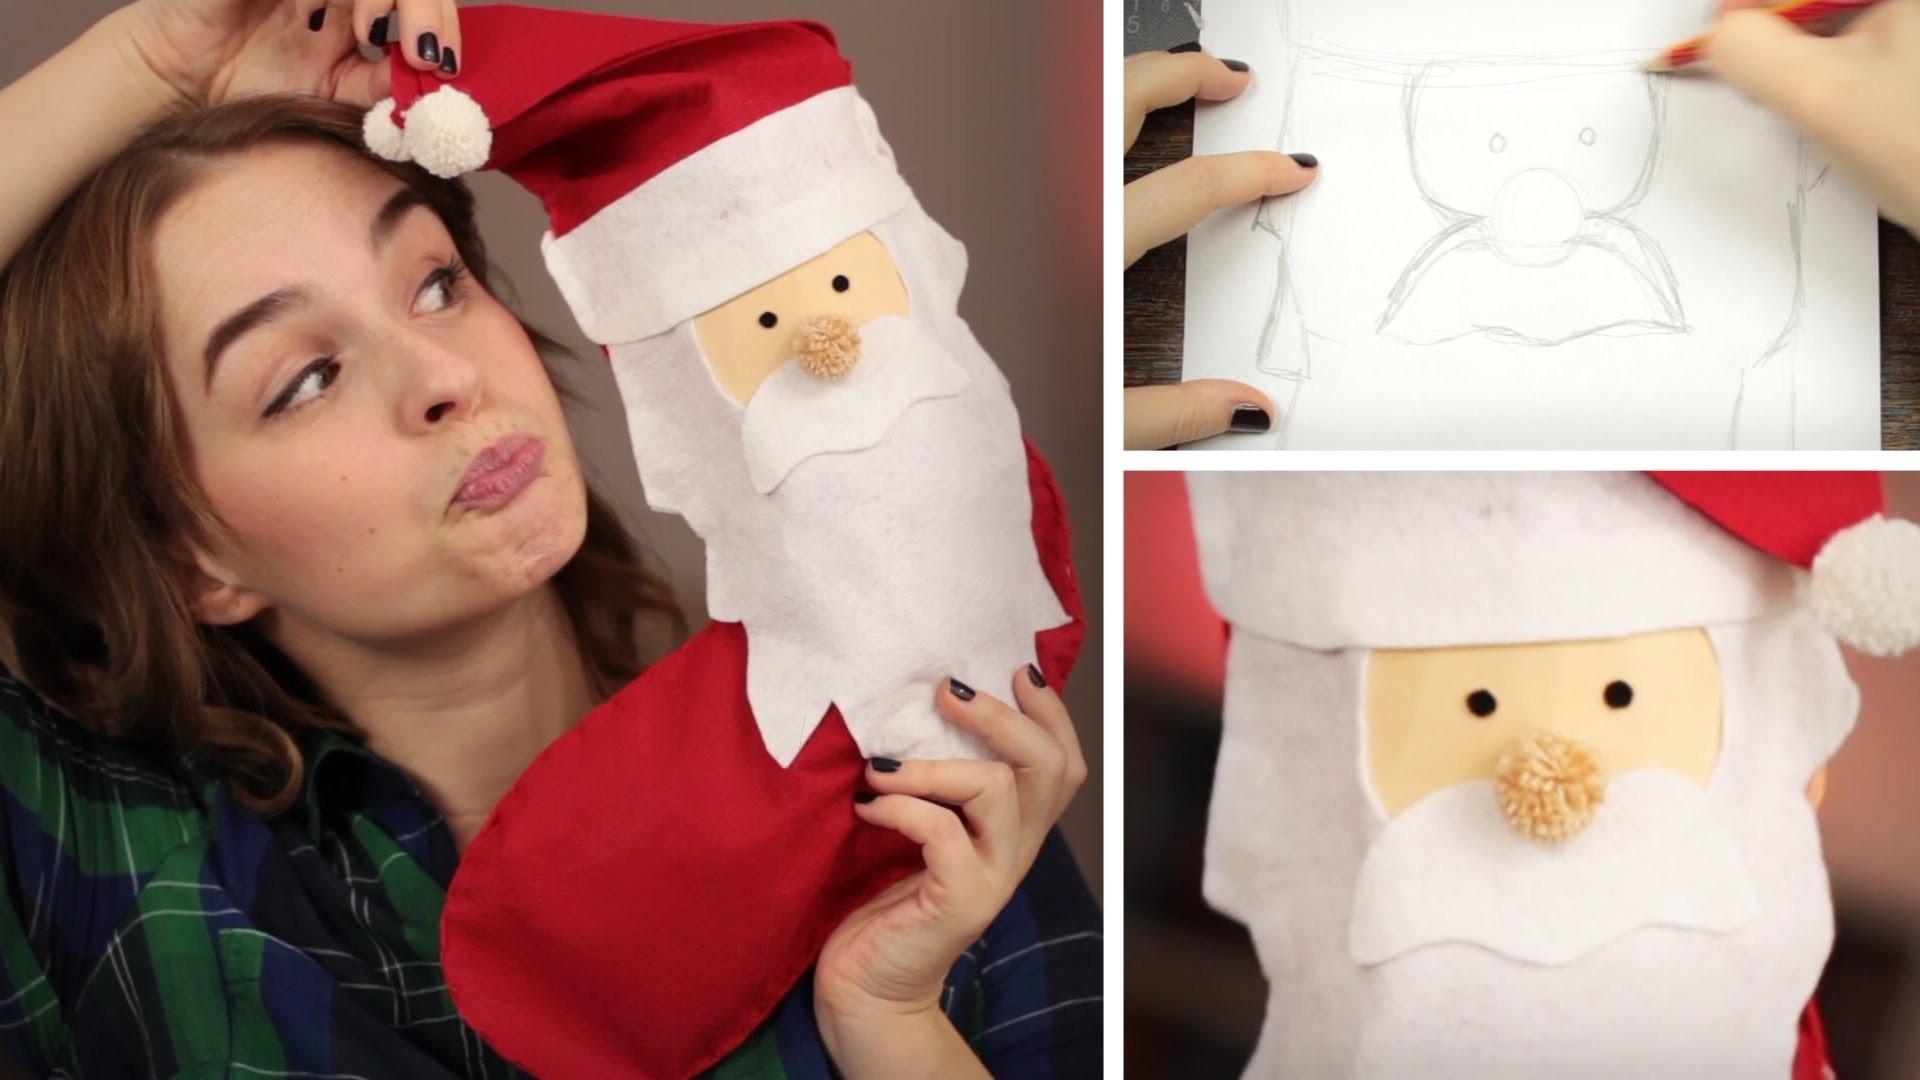 DIY NikolausStrumpf aus Filz - last minute, Hand genäht - Weihnachtssocken